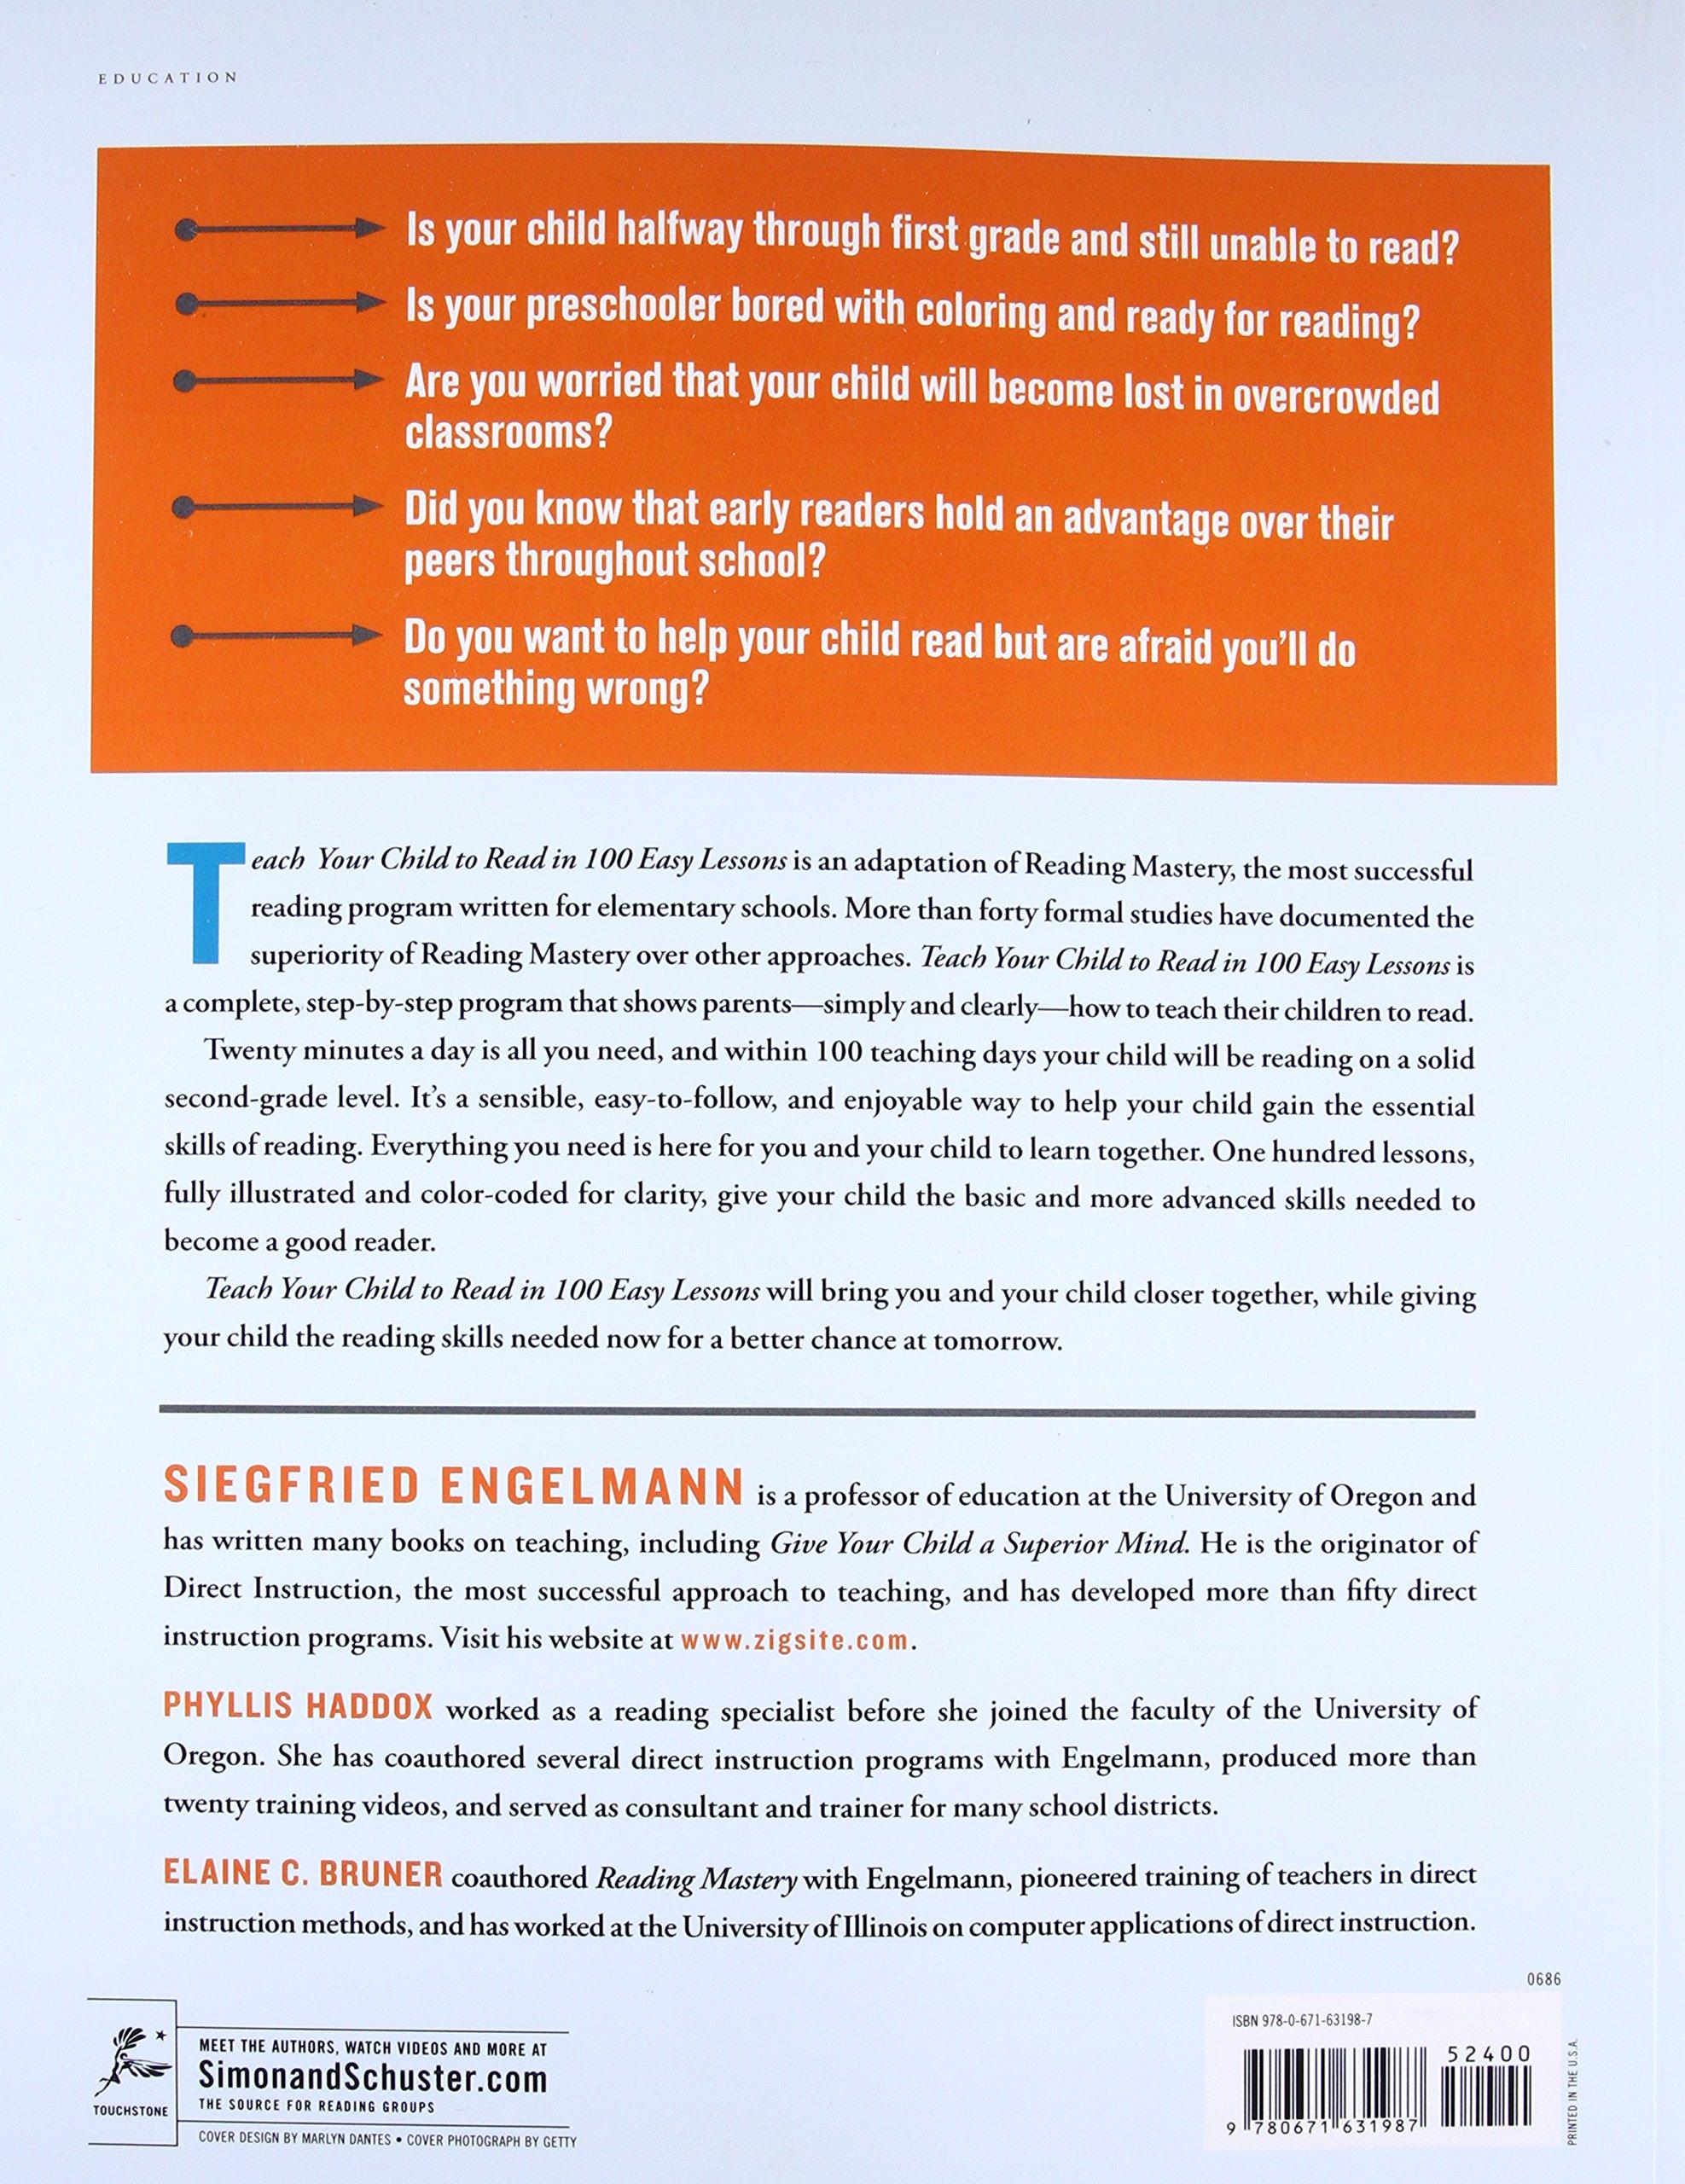 Amazon teach your child to read in 100 easy lessons amazon teach your child to read in 100 easy lessons 8601300365237 siegfried engelmann phyllis haddox elaine bruner books fandeluxe Images